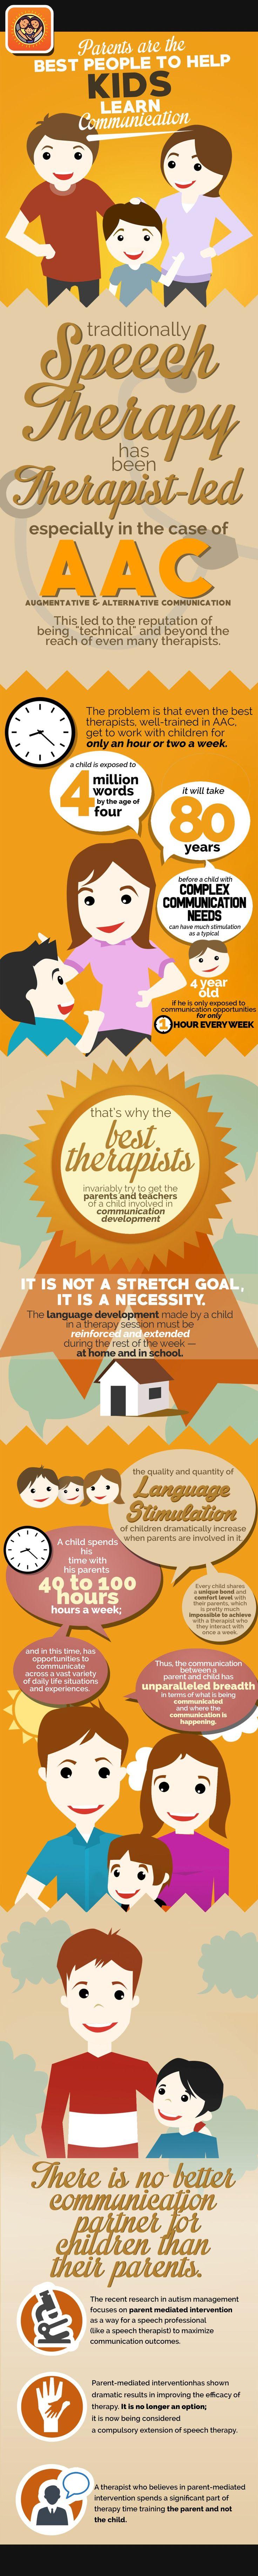 speech on parents are the best teacher of a child